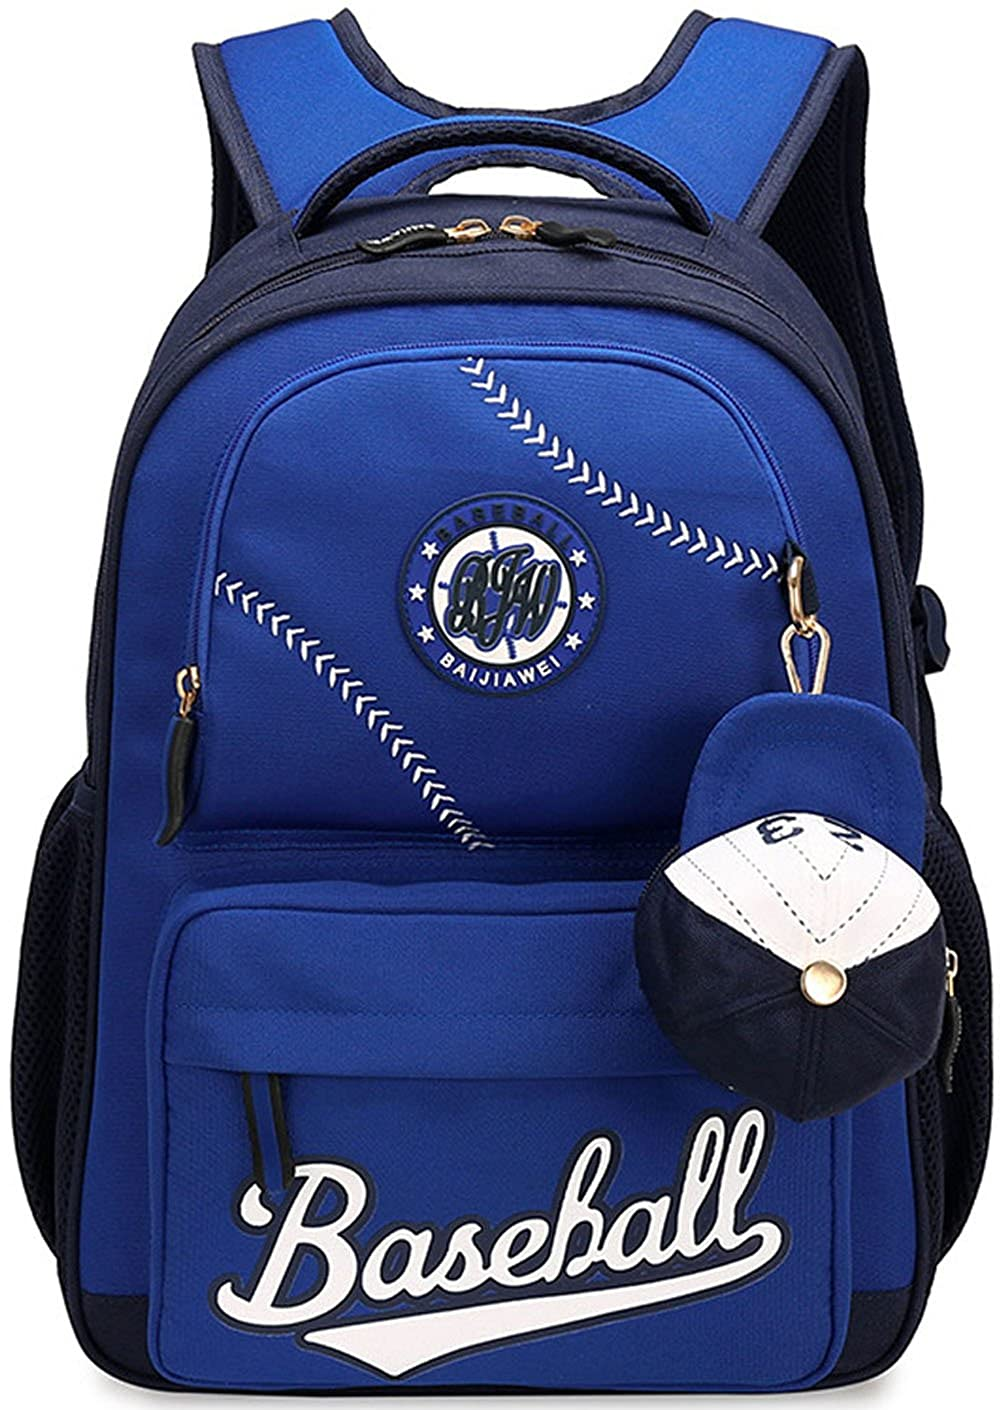 4cc6f3900b10 Amazon.com | Boys Backpack, Gazigo Children Kids Baseball Backpacks ...